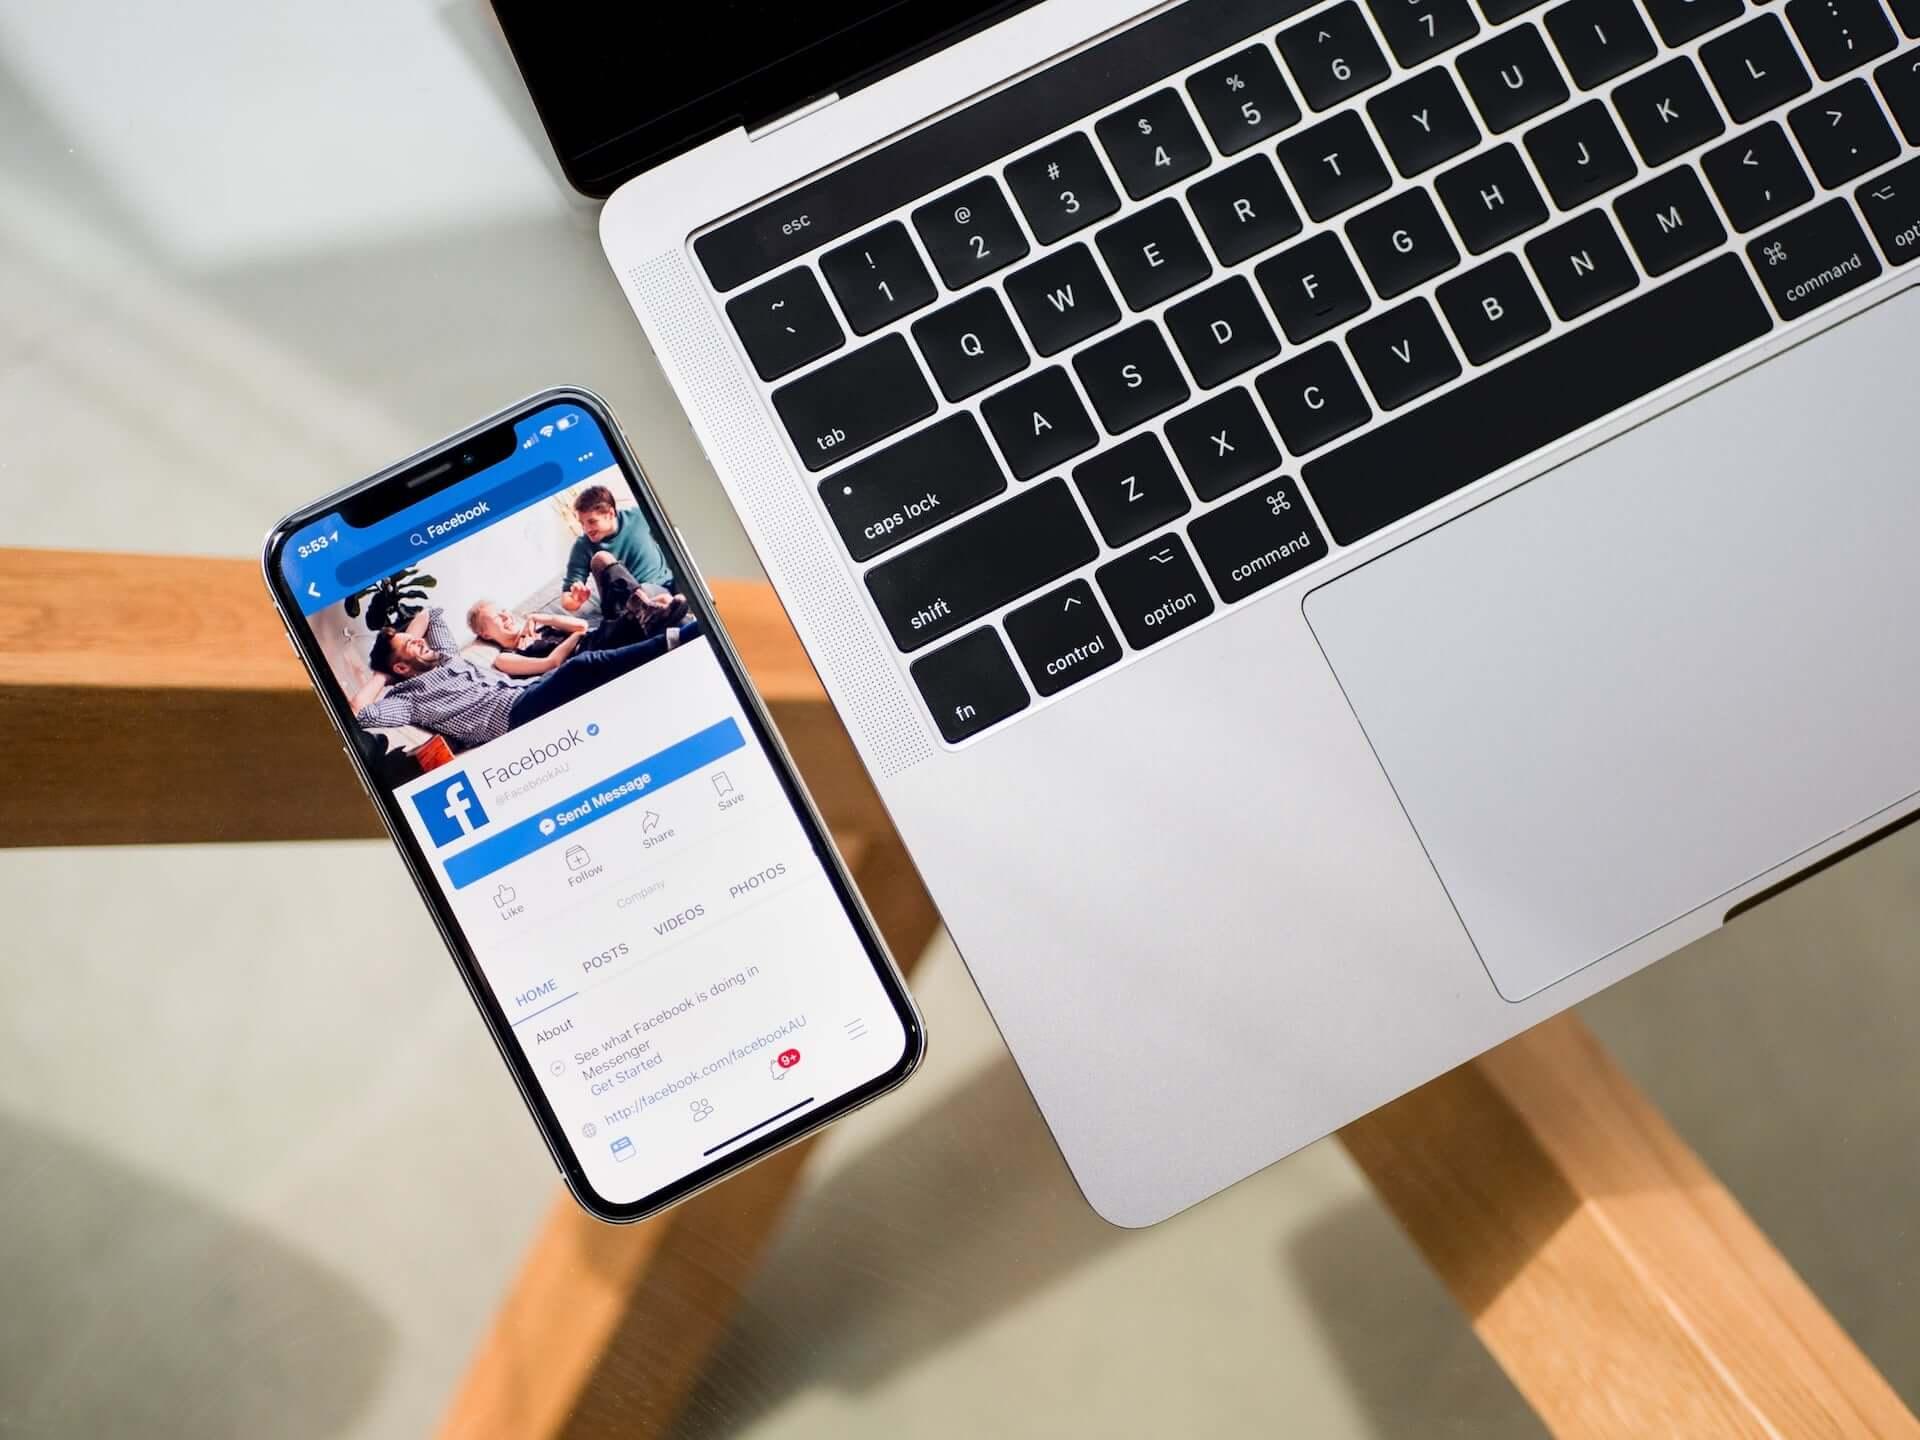 Facebookのわずらわしい通知がなくなるかも! tech190626_facebook_notification_main-1920x1440